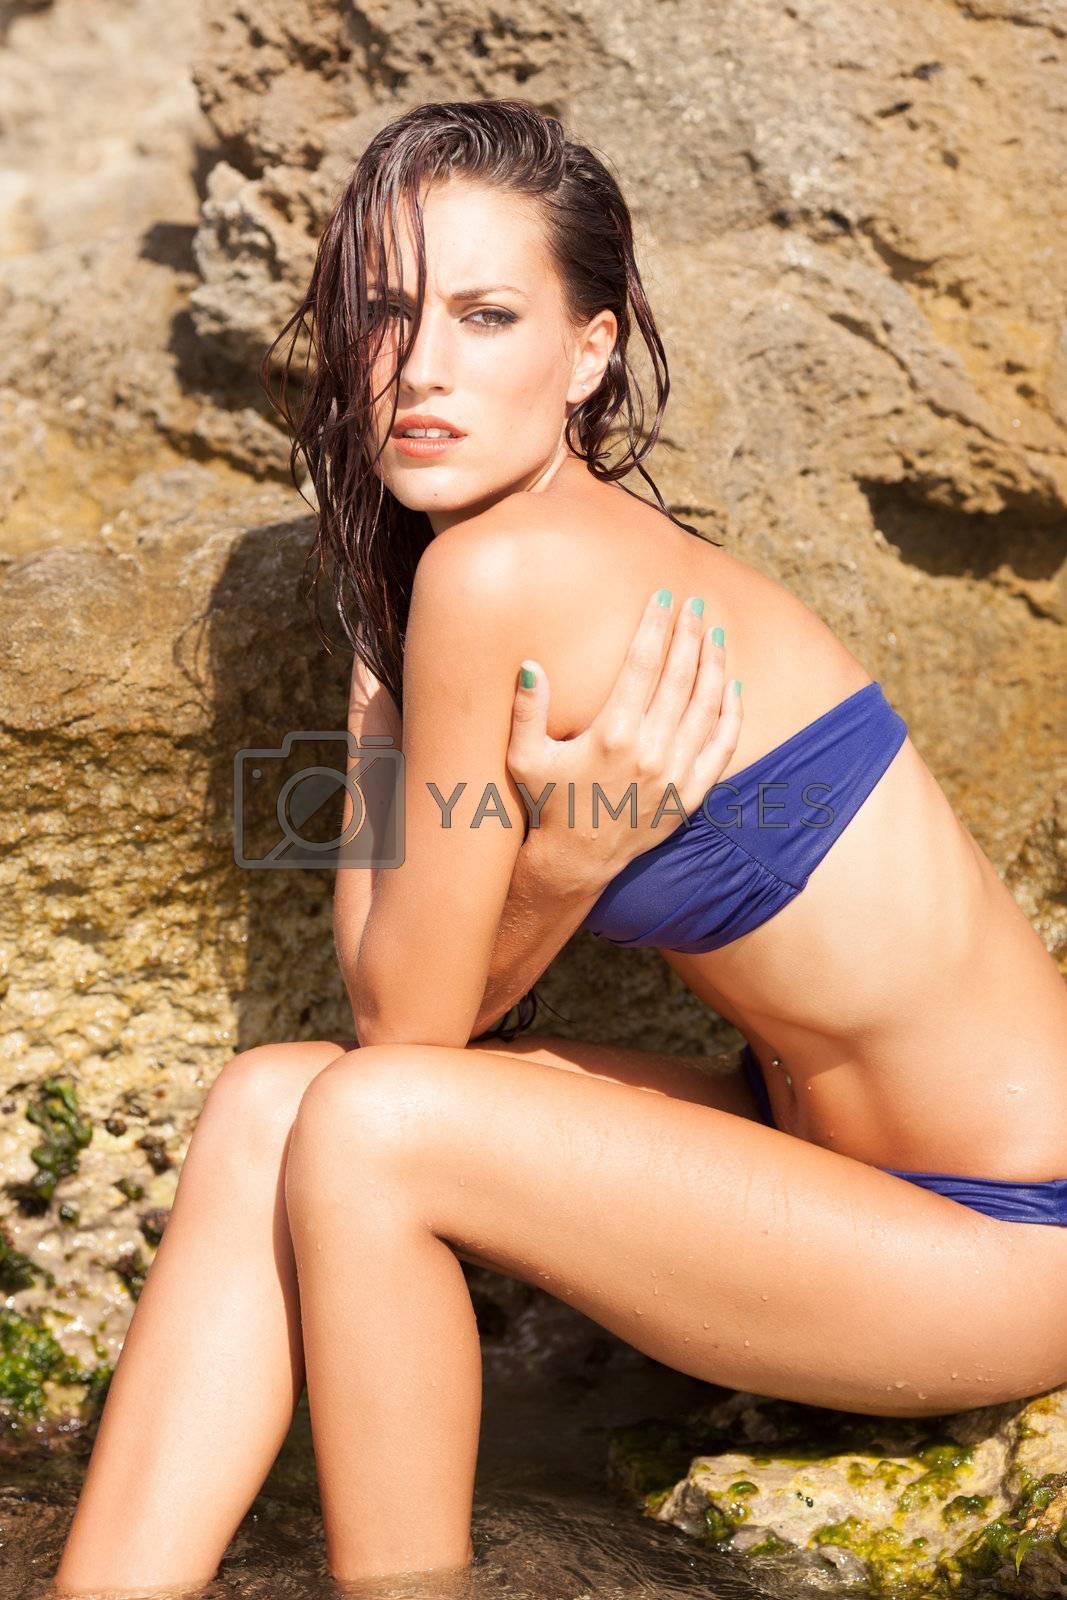 Portrait of sexy model enjoying a bath in the ocean with rocks